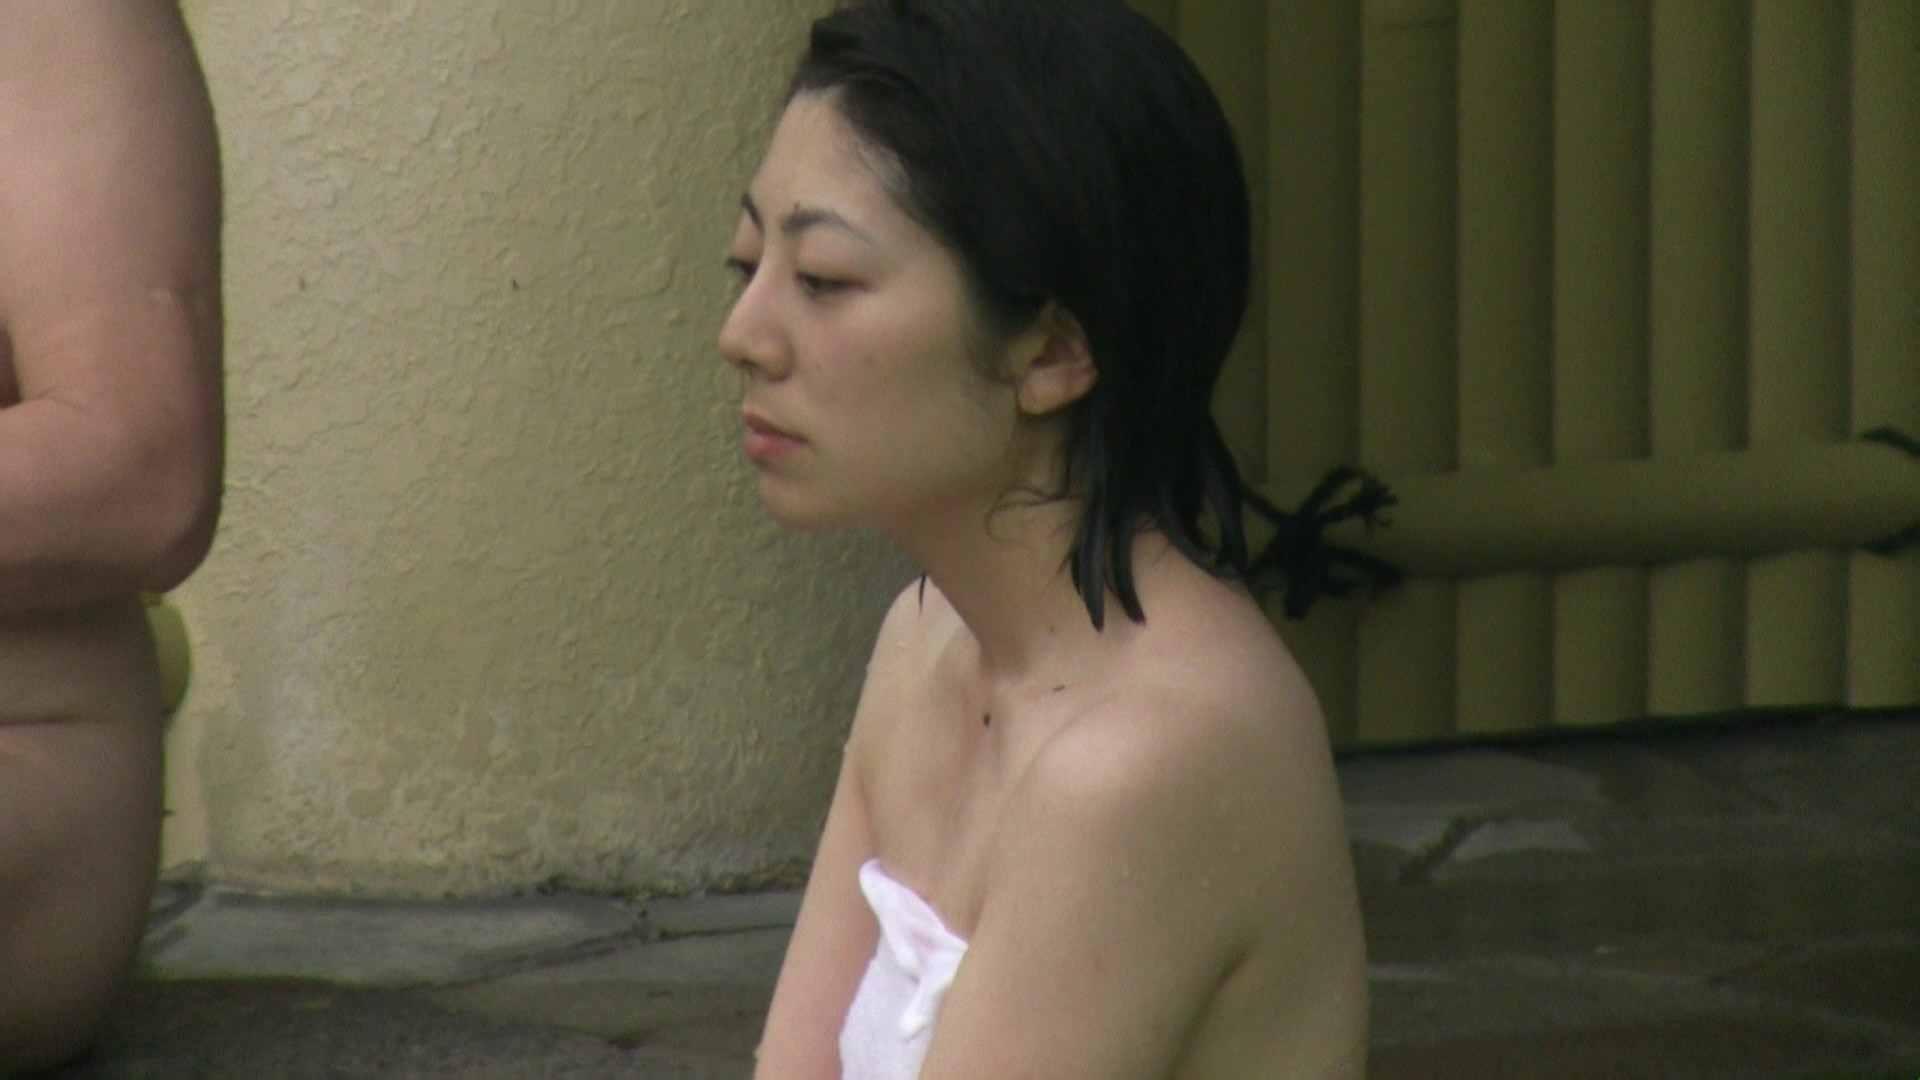 Aquaな露天風呂Vol.04 露天風呂編  94PIX 46